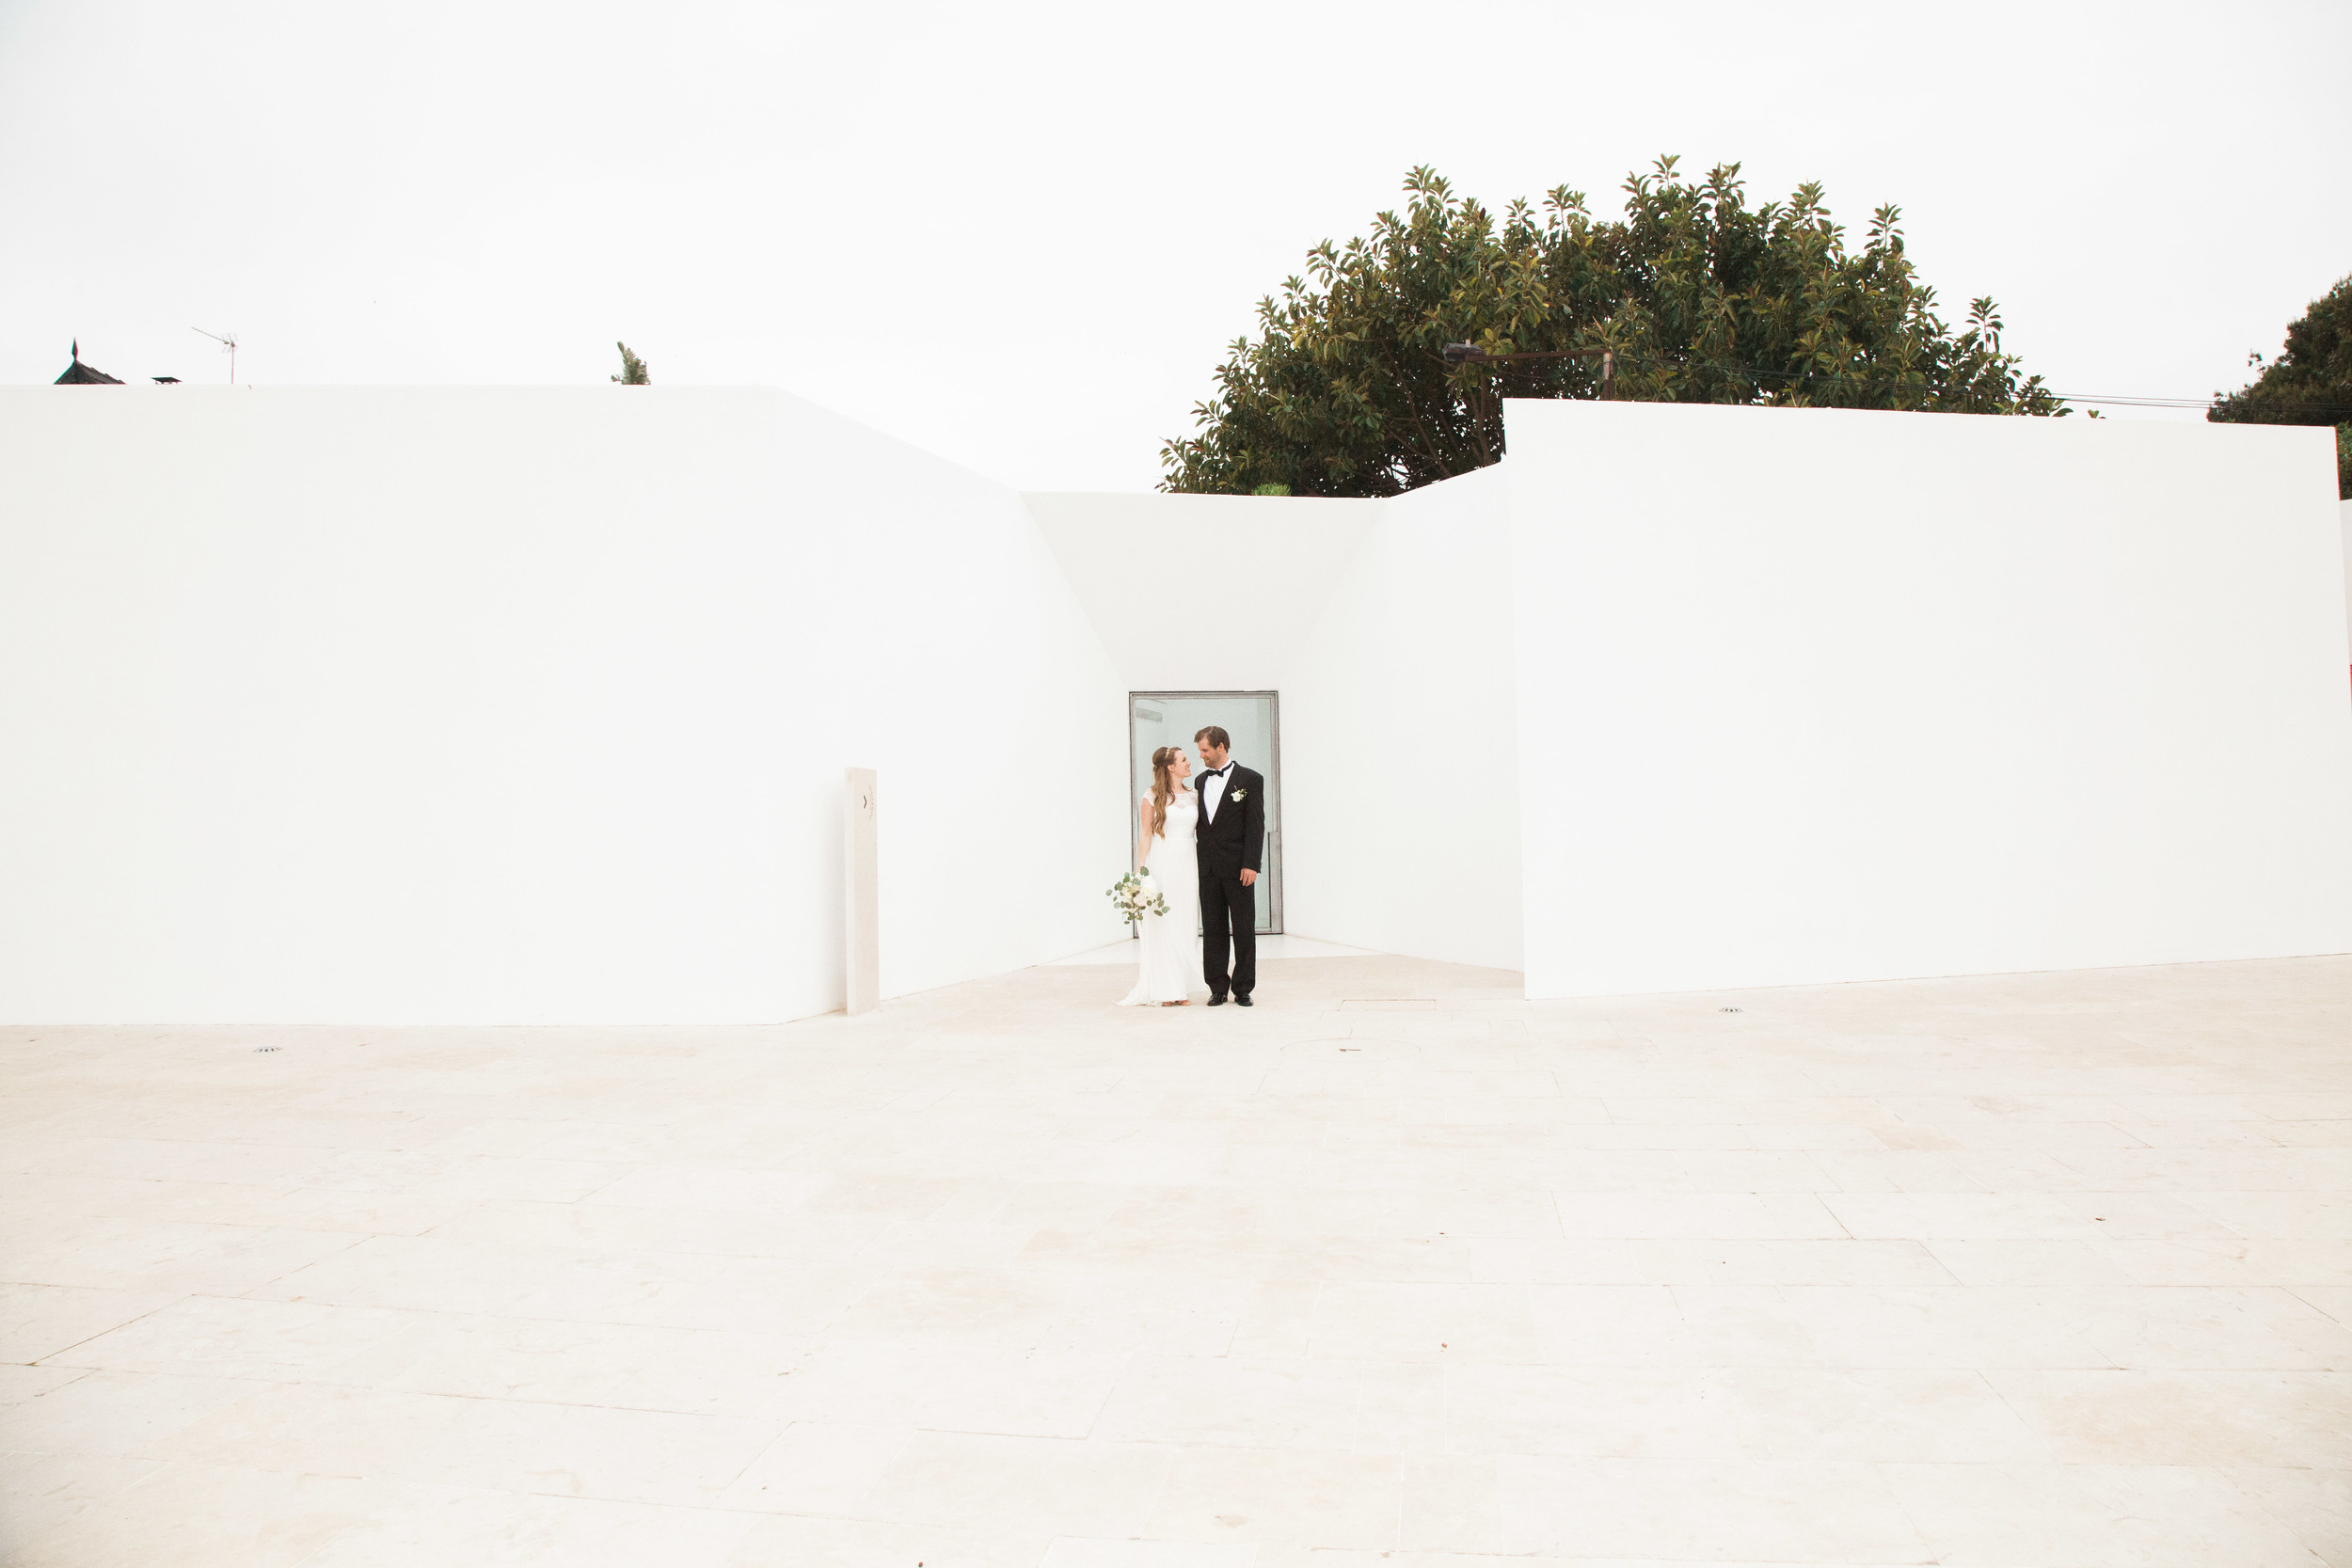 mariarao+wedding+portugal+cascais-373.jpg